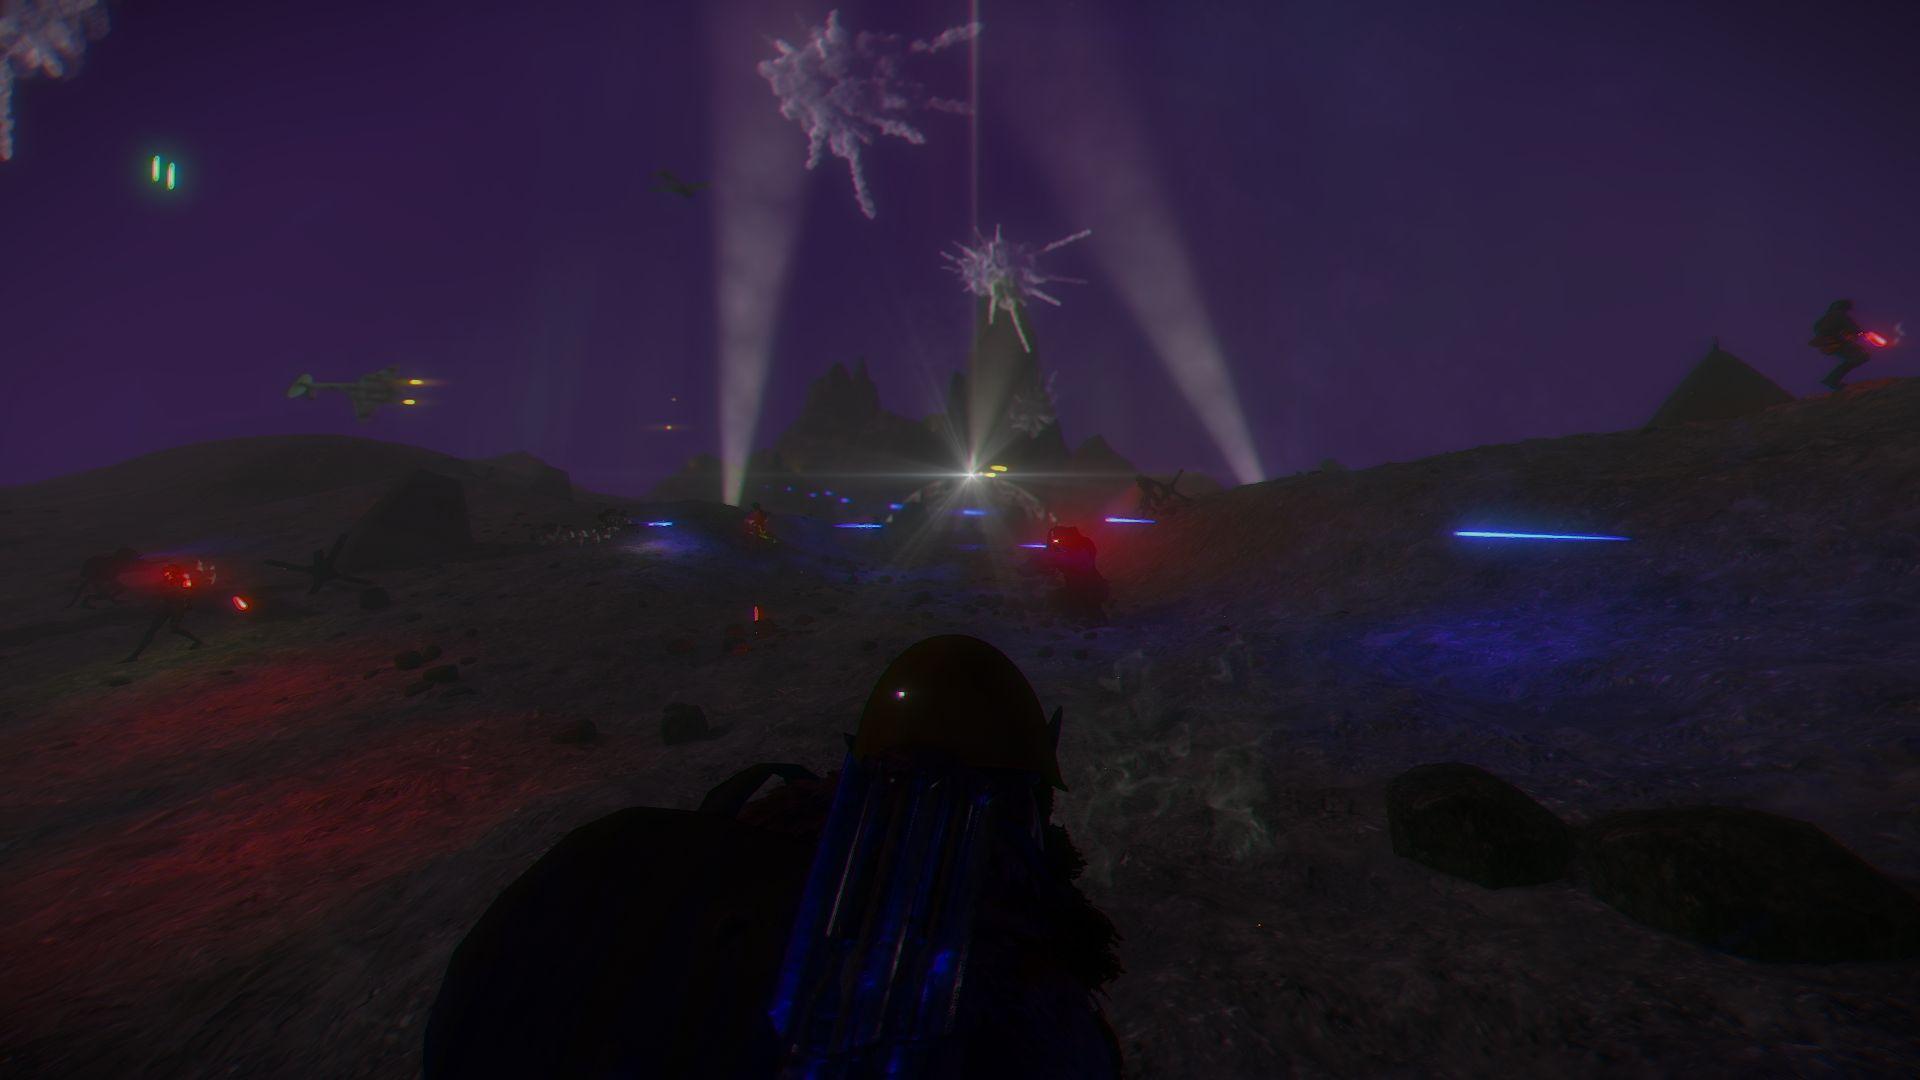 Attack at night